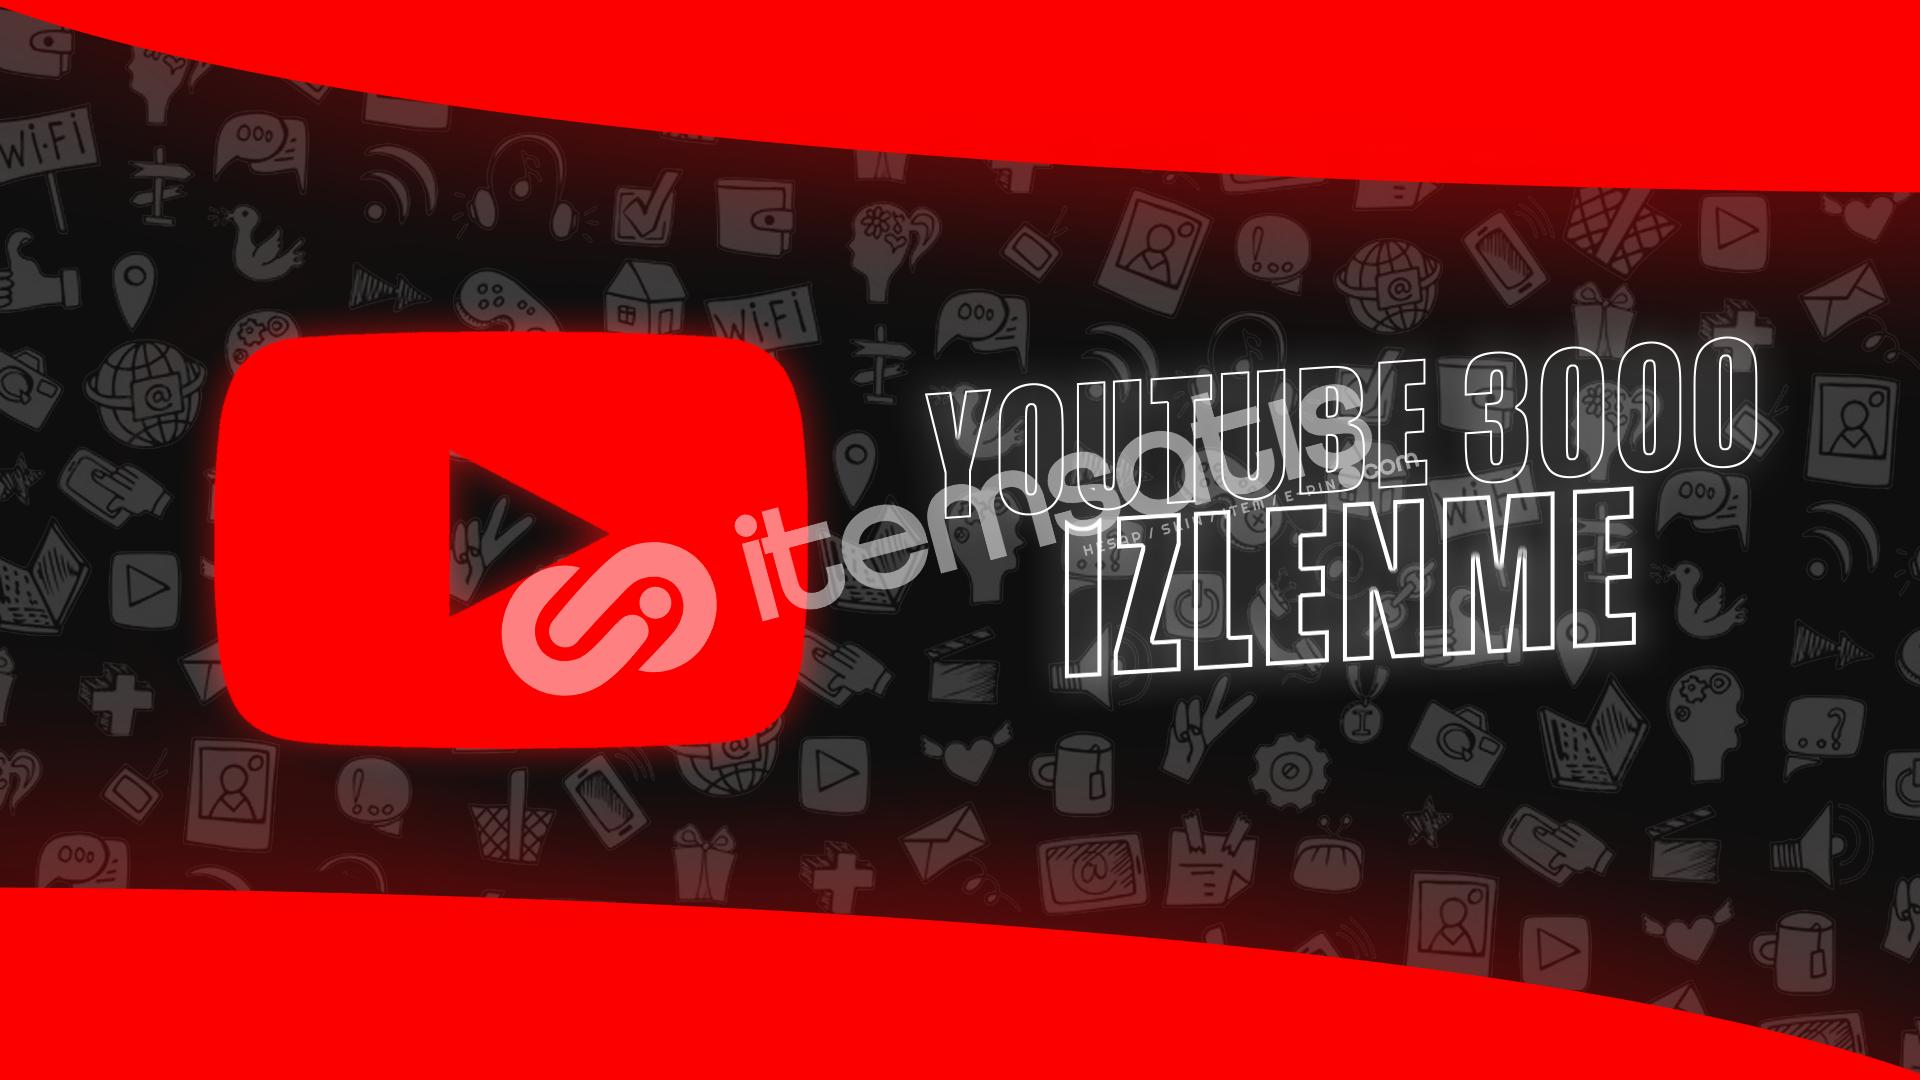 Çalışan Tek Servis! YouTube 3000 İzlenme - 18TL